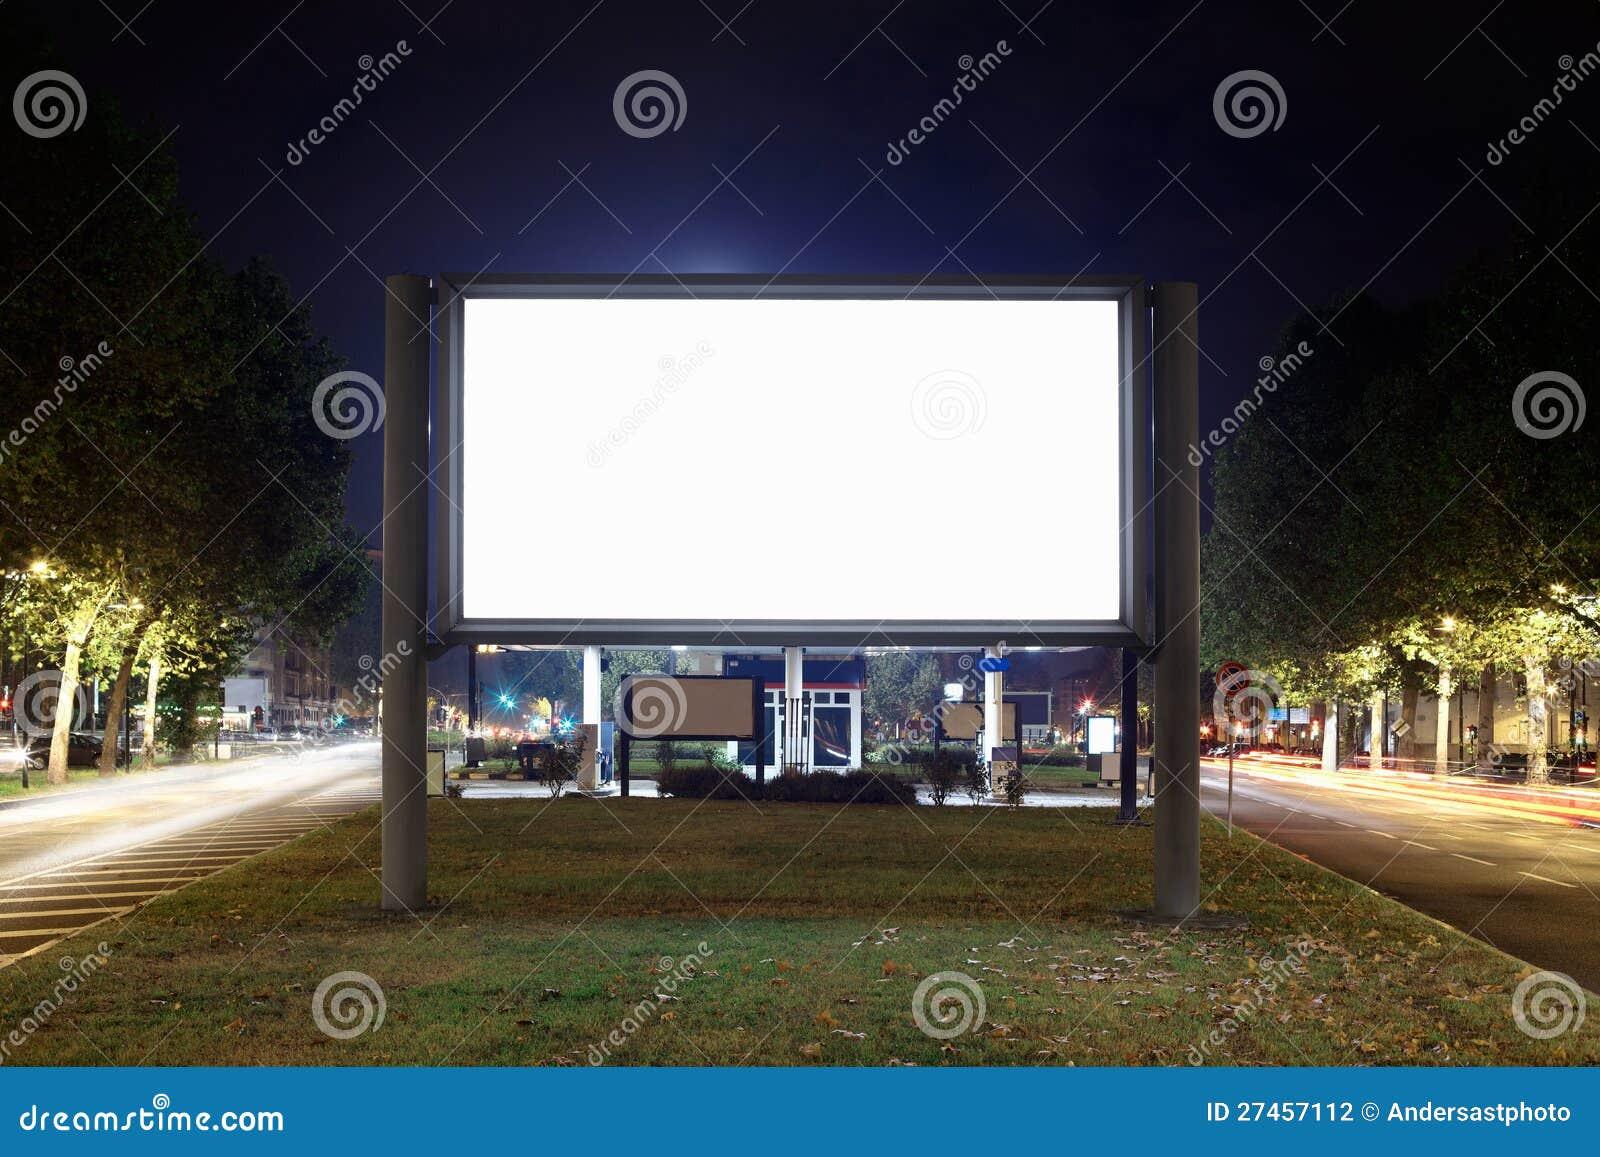 Blank Billboard At Night Stock Photography - Image: 27457112